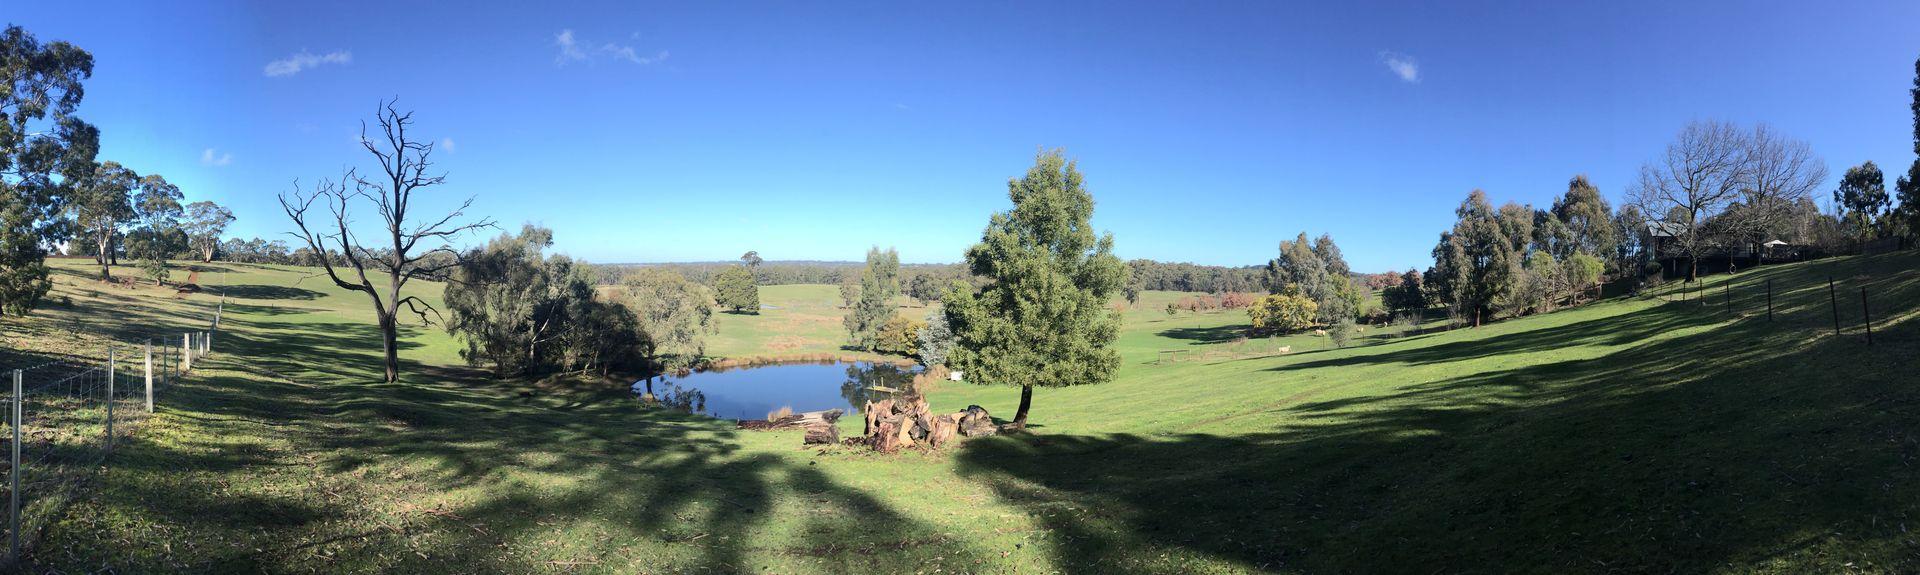 Woodend North VIC, Australia